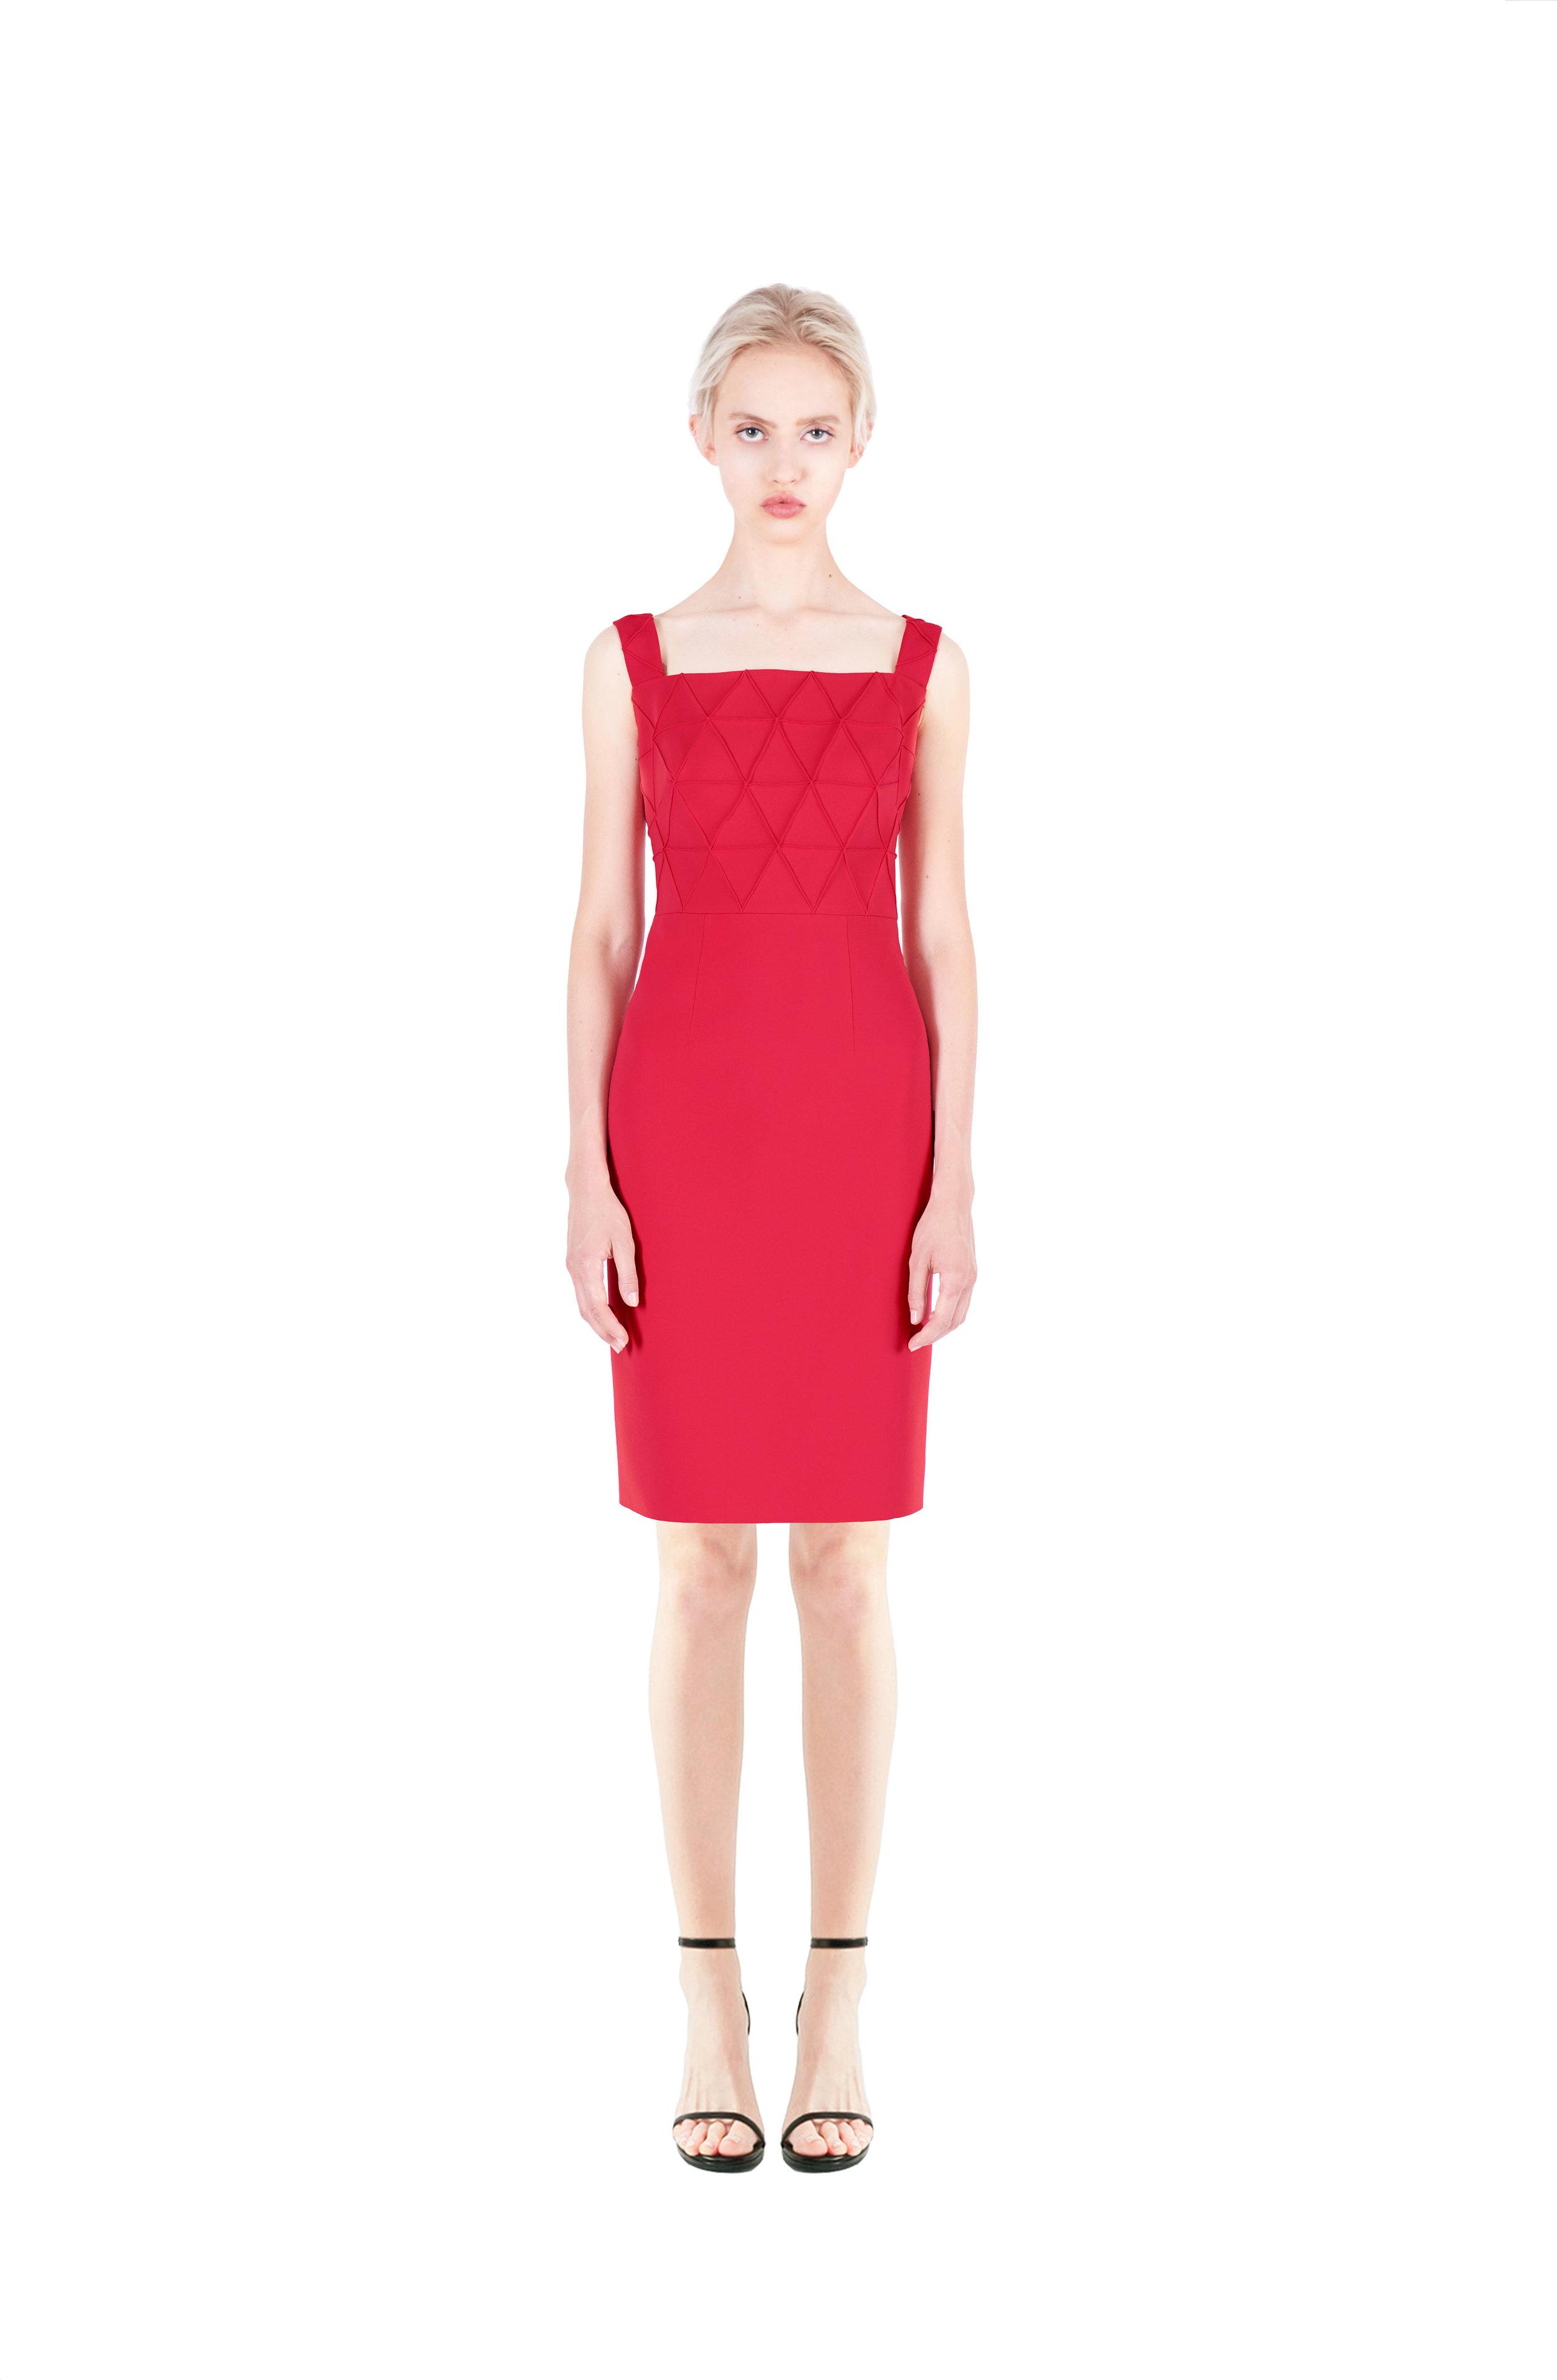 Oyagami strap dress